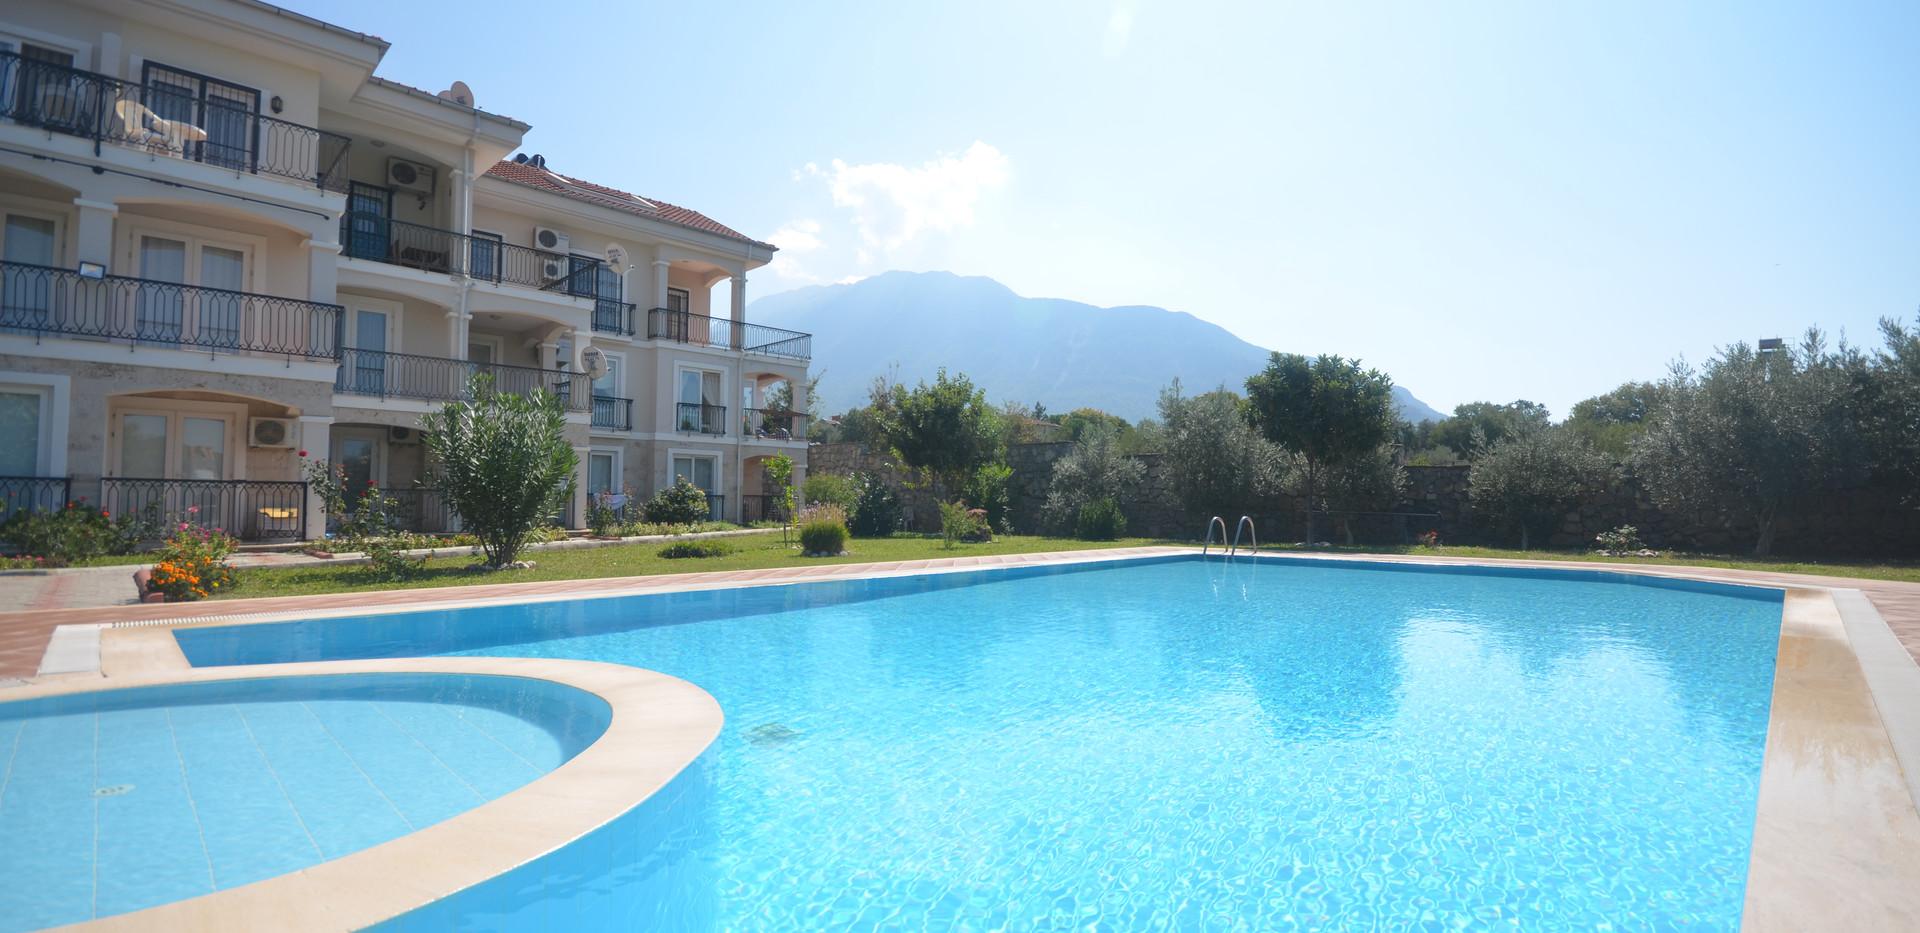 Pool & Aparts